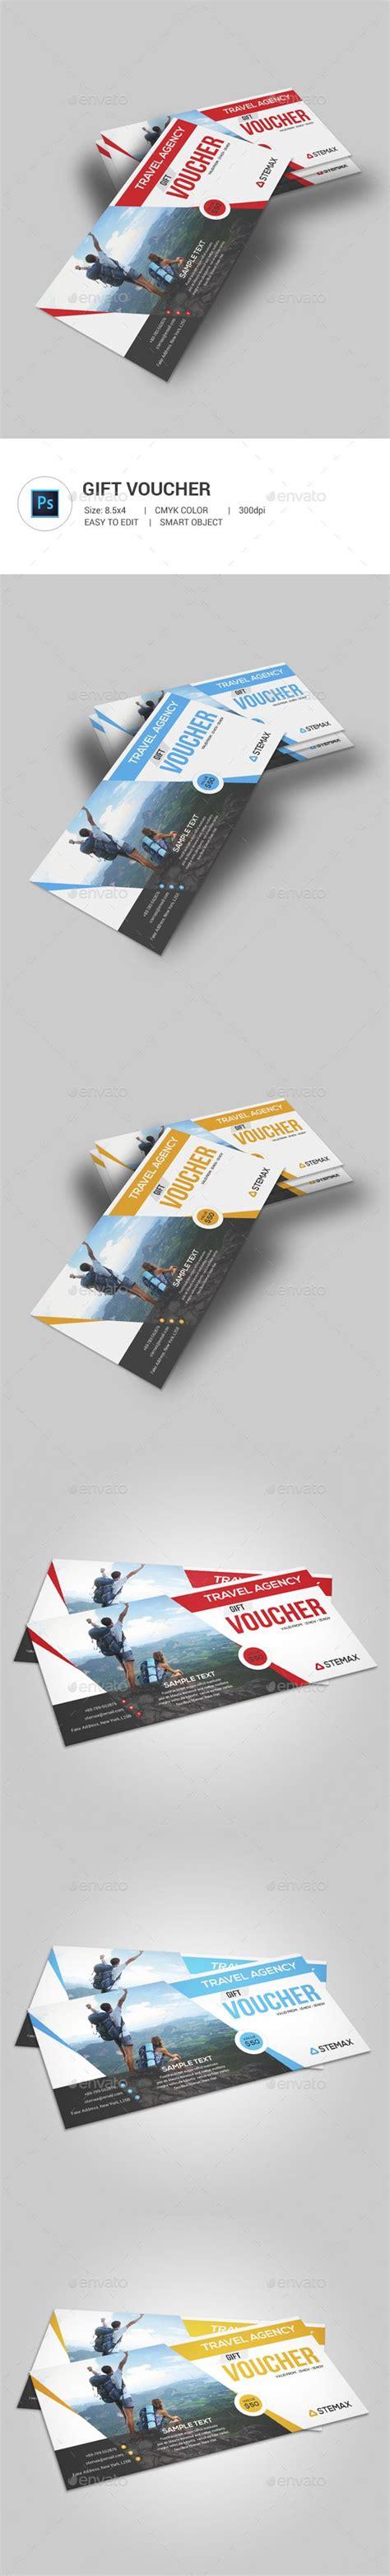 Travel Agency Gift Cards - best 25 gift vouchers ideas on pinterest gift voucher design brochure ideas and